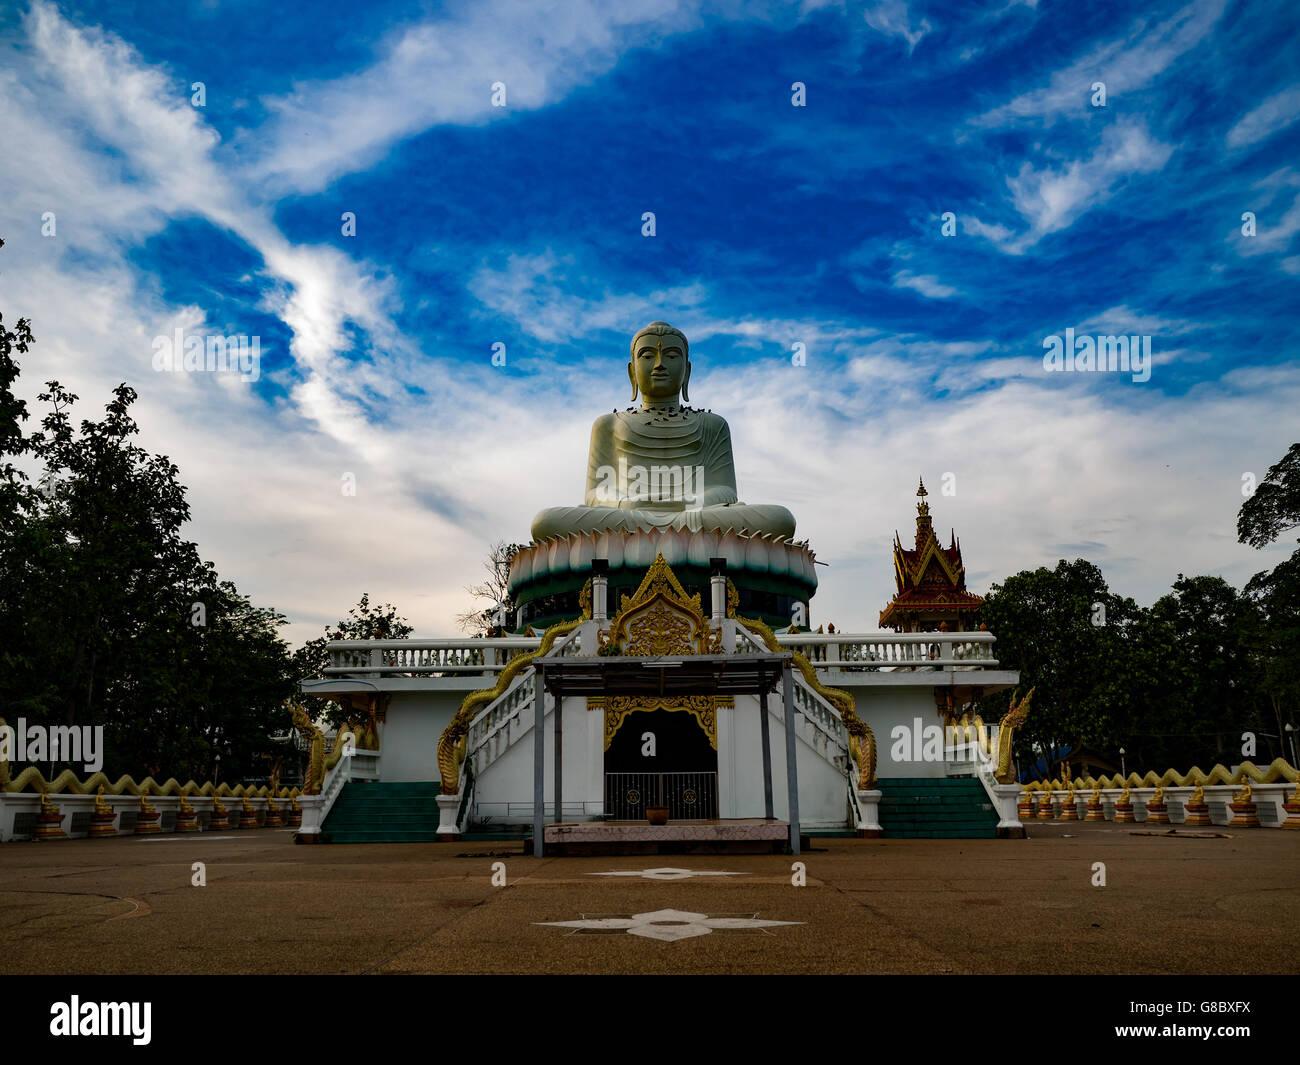 Buddhist,temple,monasteries,Buddhism,sanctuary,Cathedrals,thai - Stock Image